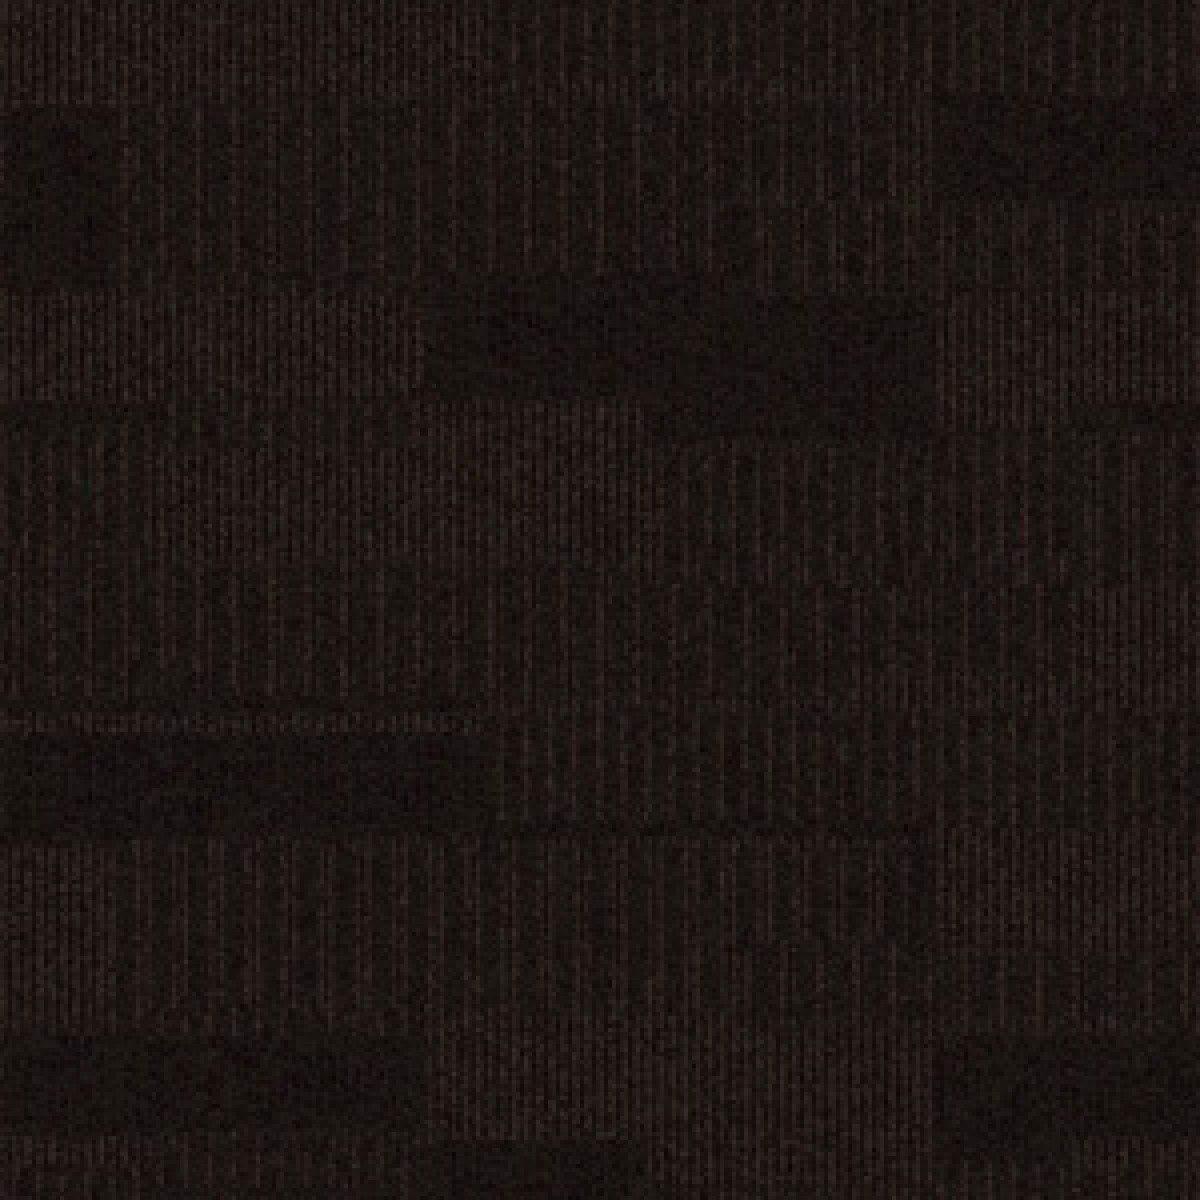 Chocolate Brown Carpet Tiles Carpet Vidalondon Textured Carpet Brown Carpet Office Carpet